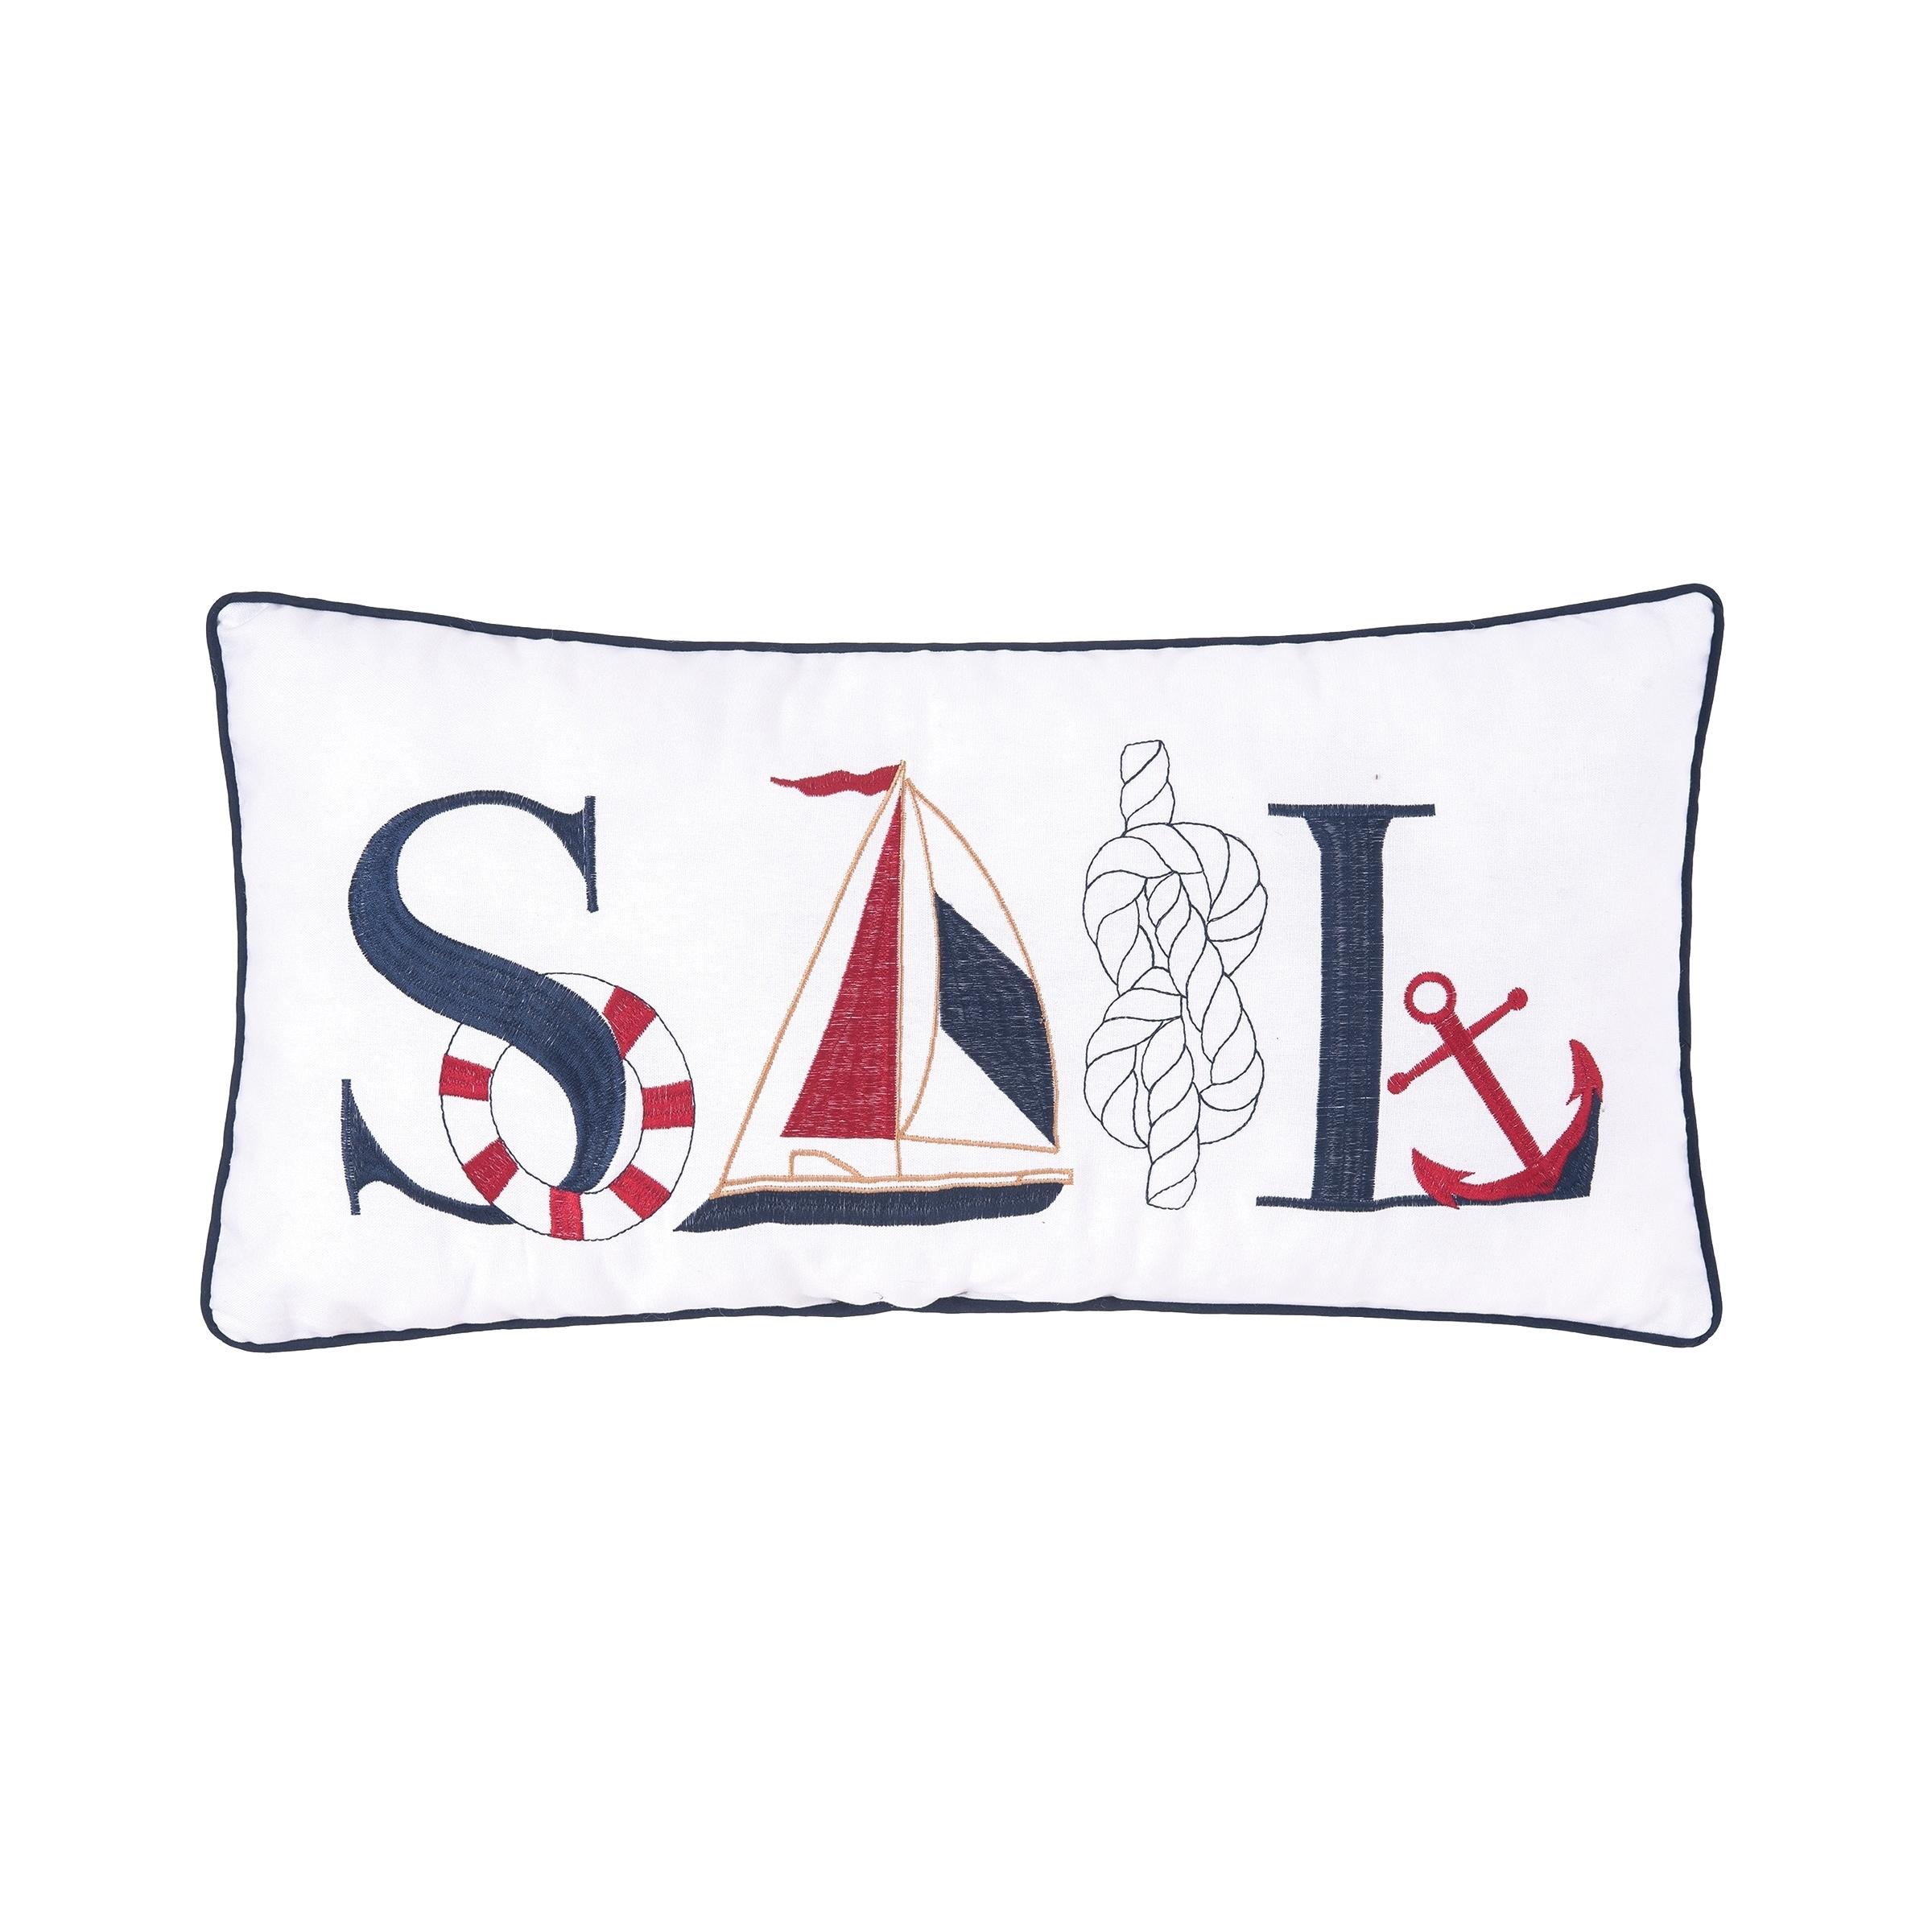 Sail 12 x 24 Pillow